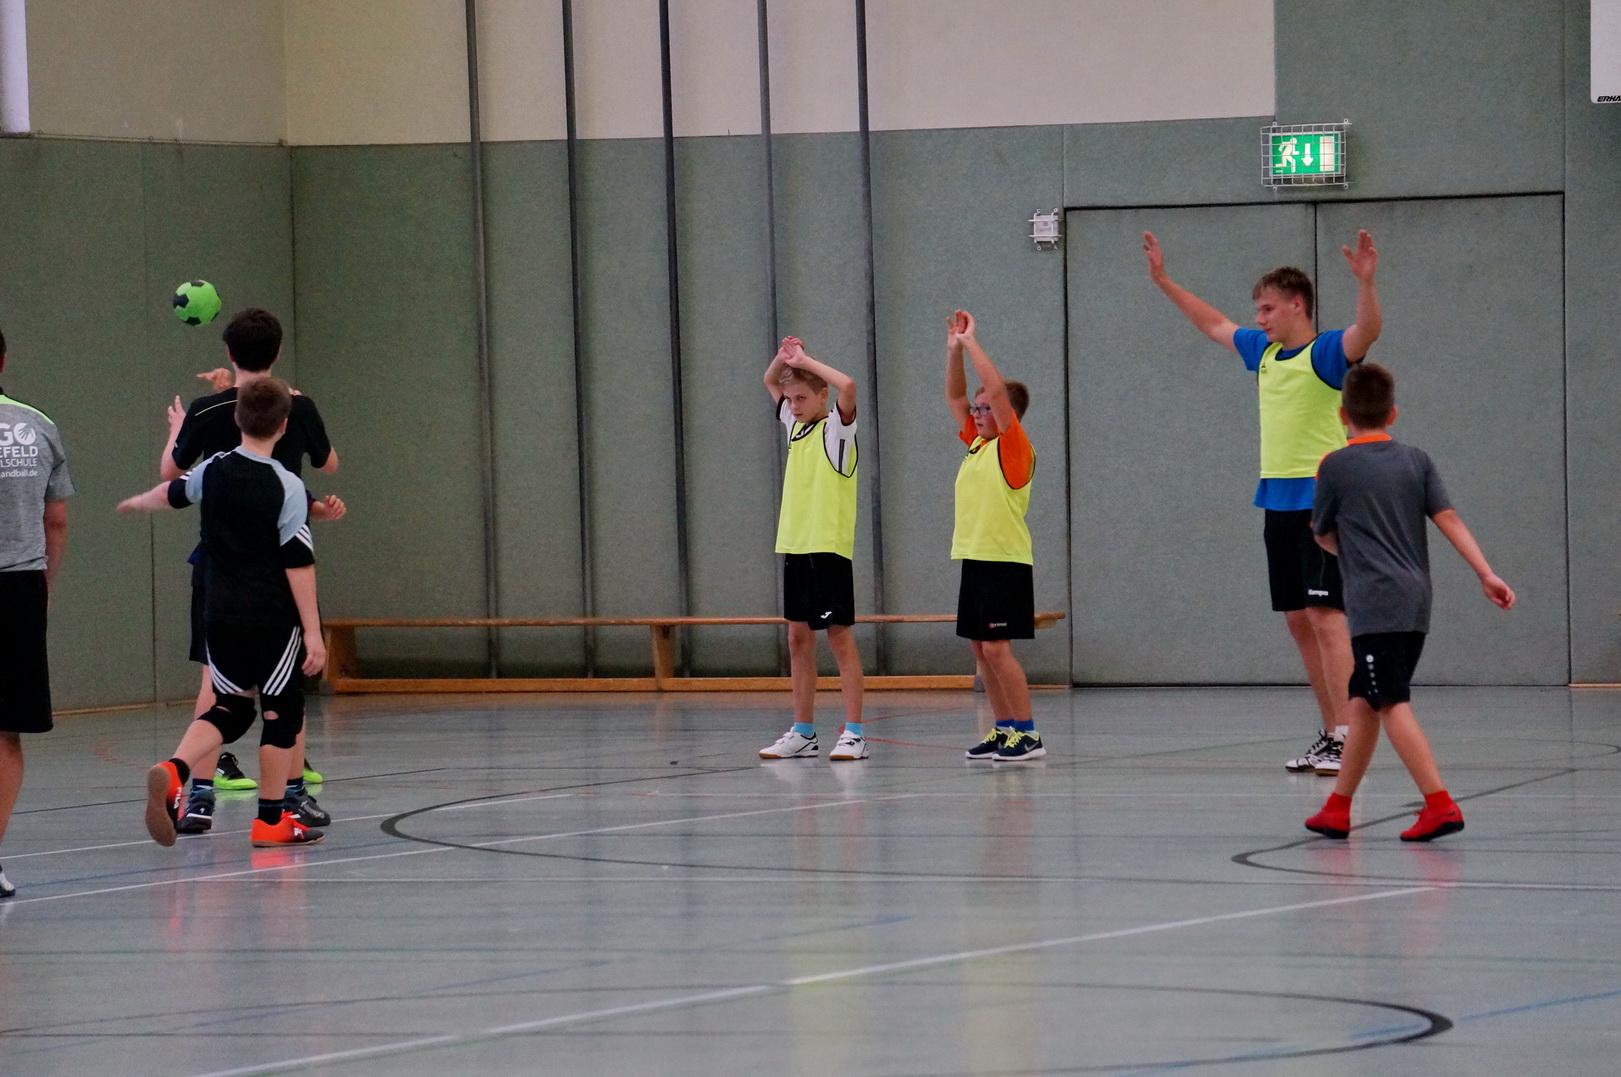 201808_Handballcamp_SDH_MG_123w